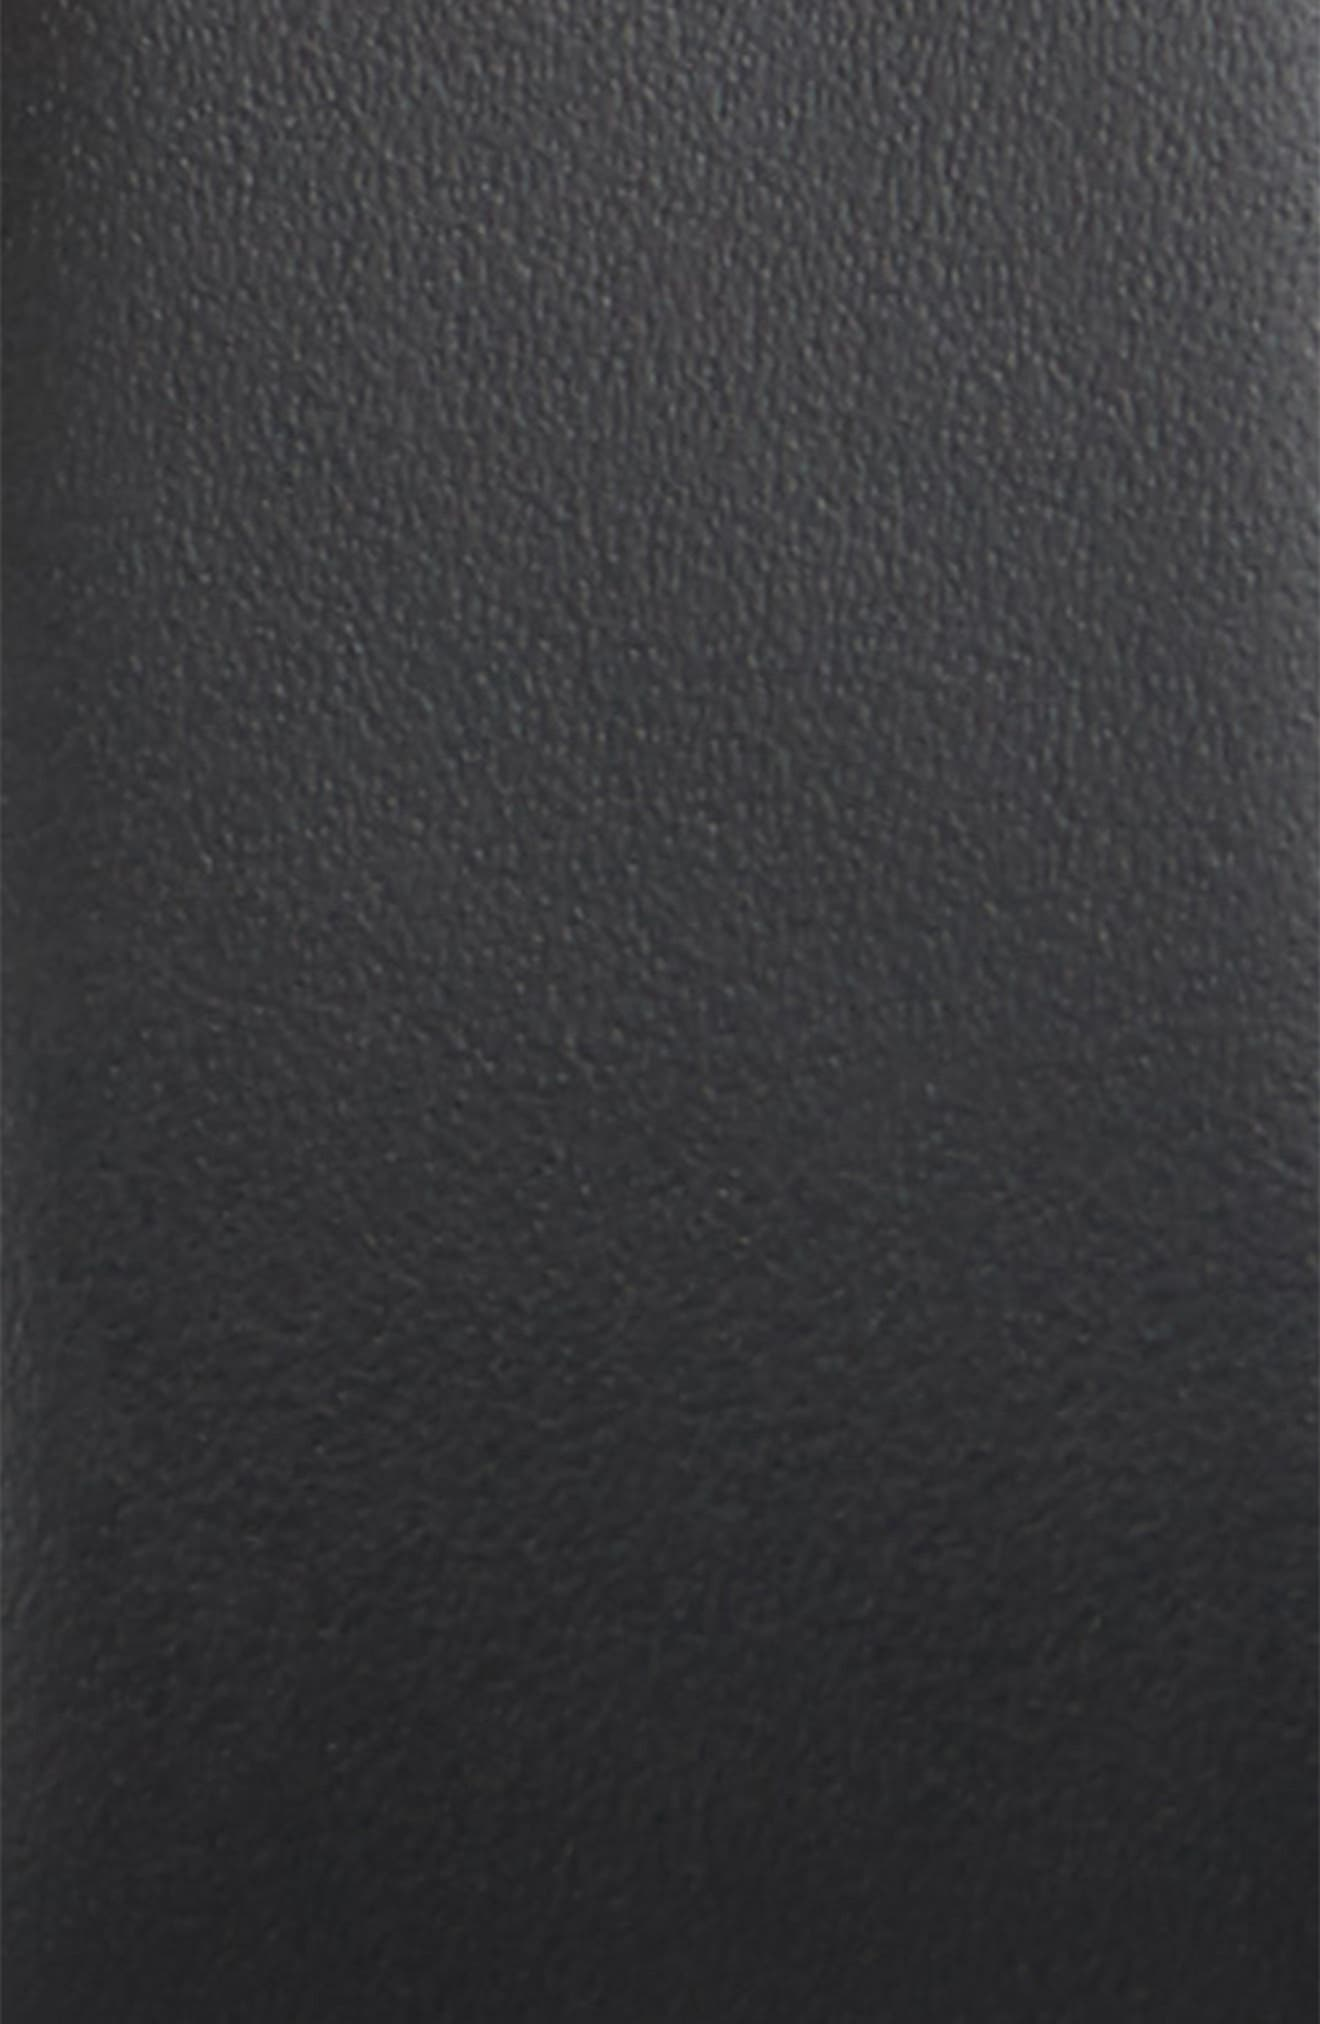 VERSACE,                             Medusa Head Leather Belt,                             Alternate thumbnail 2, color,                             BLACK/GOLD